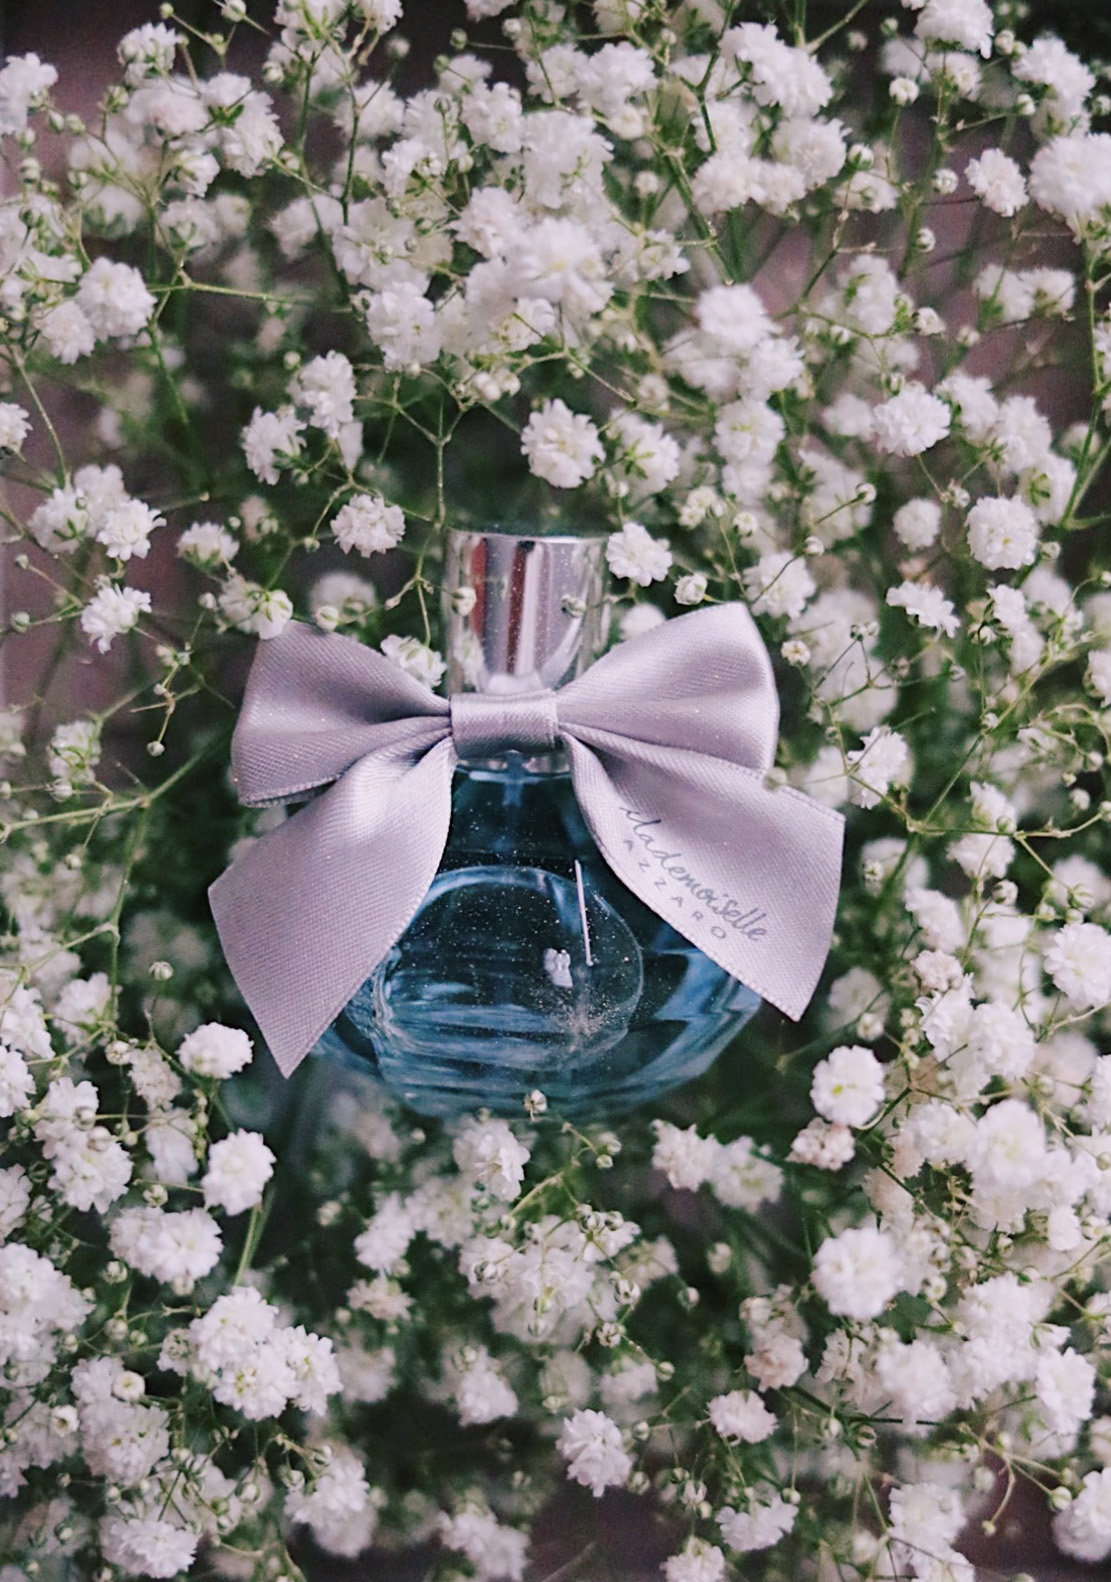 AZZARO , CLARINS , MADEMOISELLE AZZARO , Mademoiselle Azzaro L'Eau Très Charmante , Paris , rosemademoiselle , rose mademoiselle , blog beauté ,